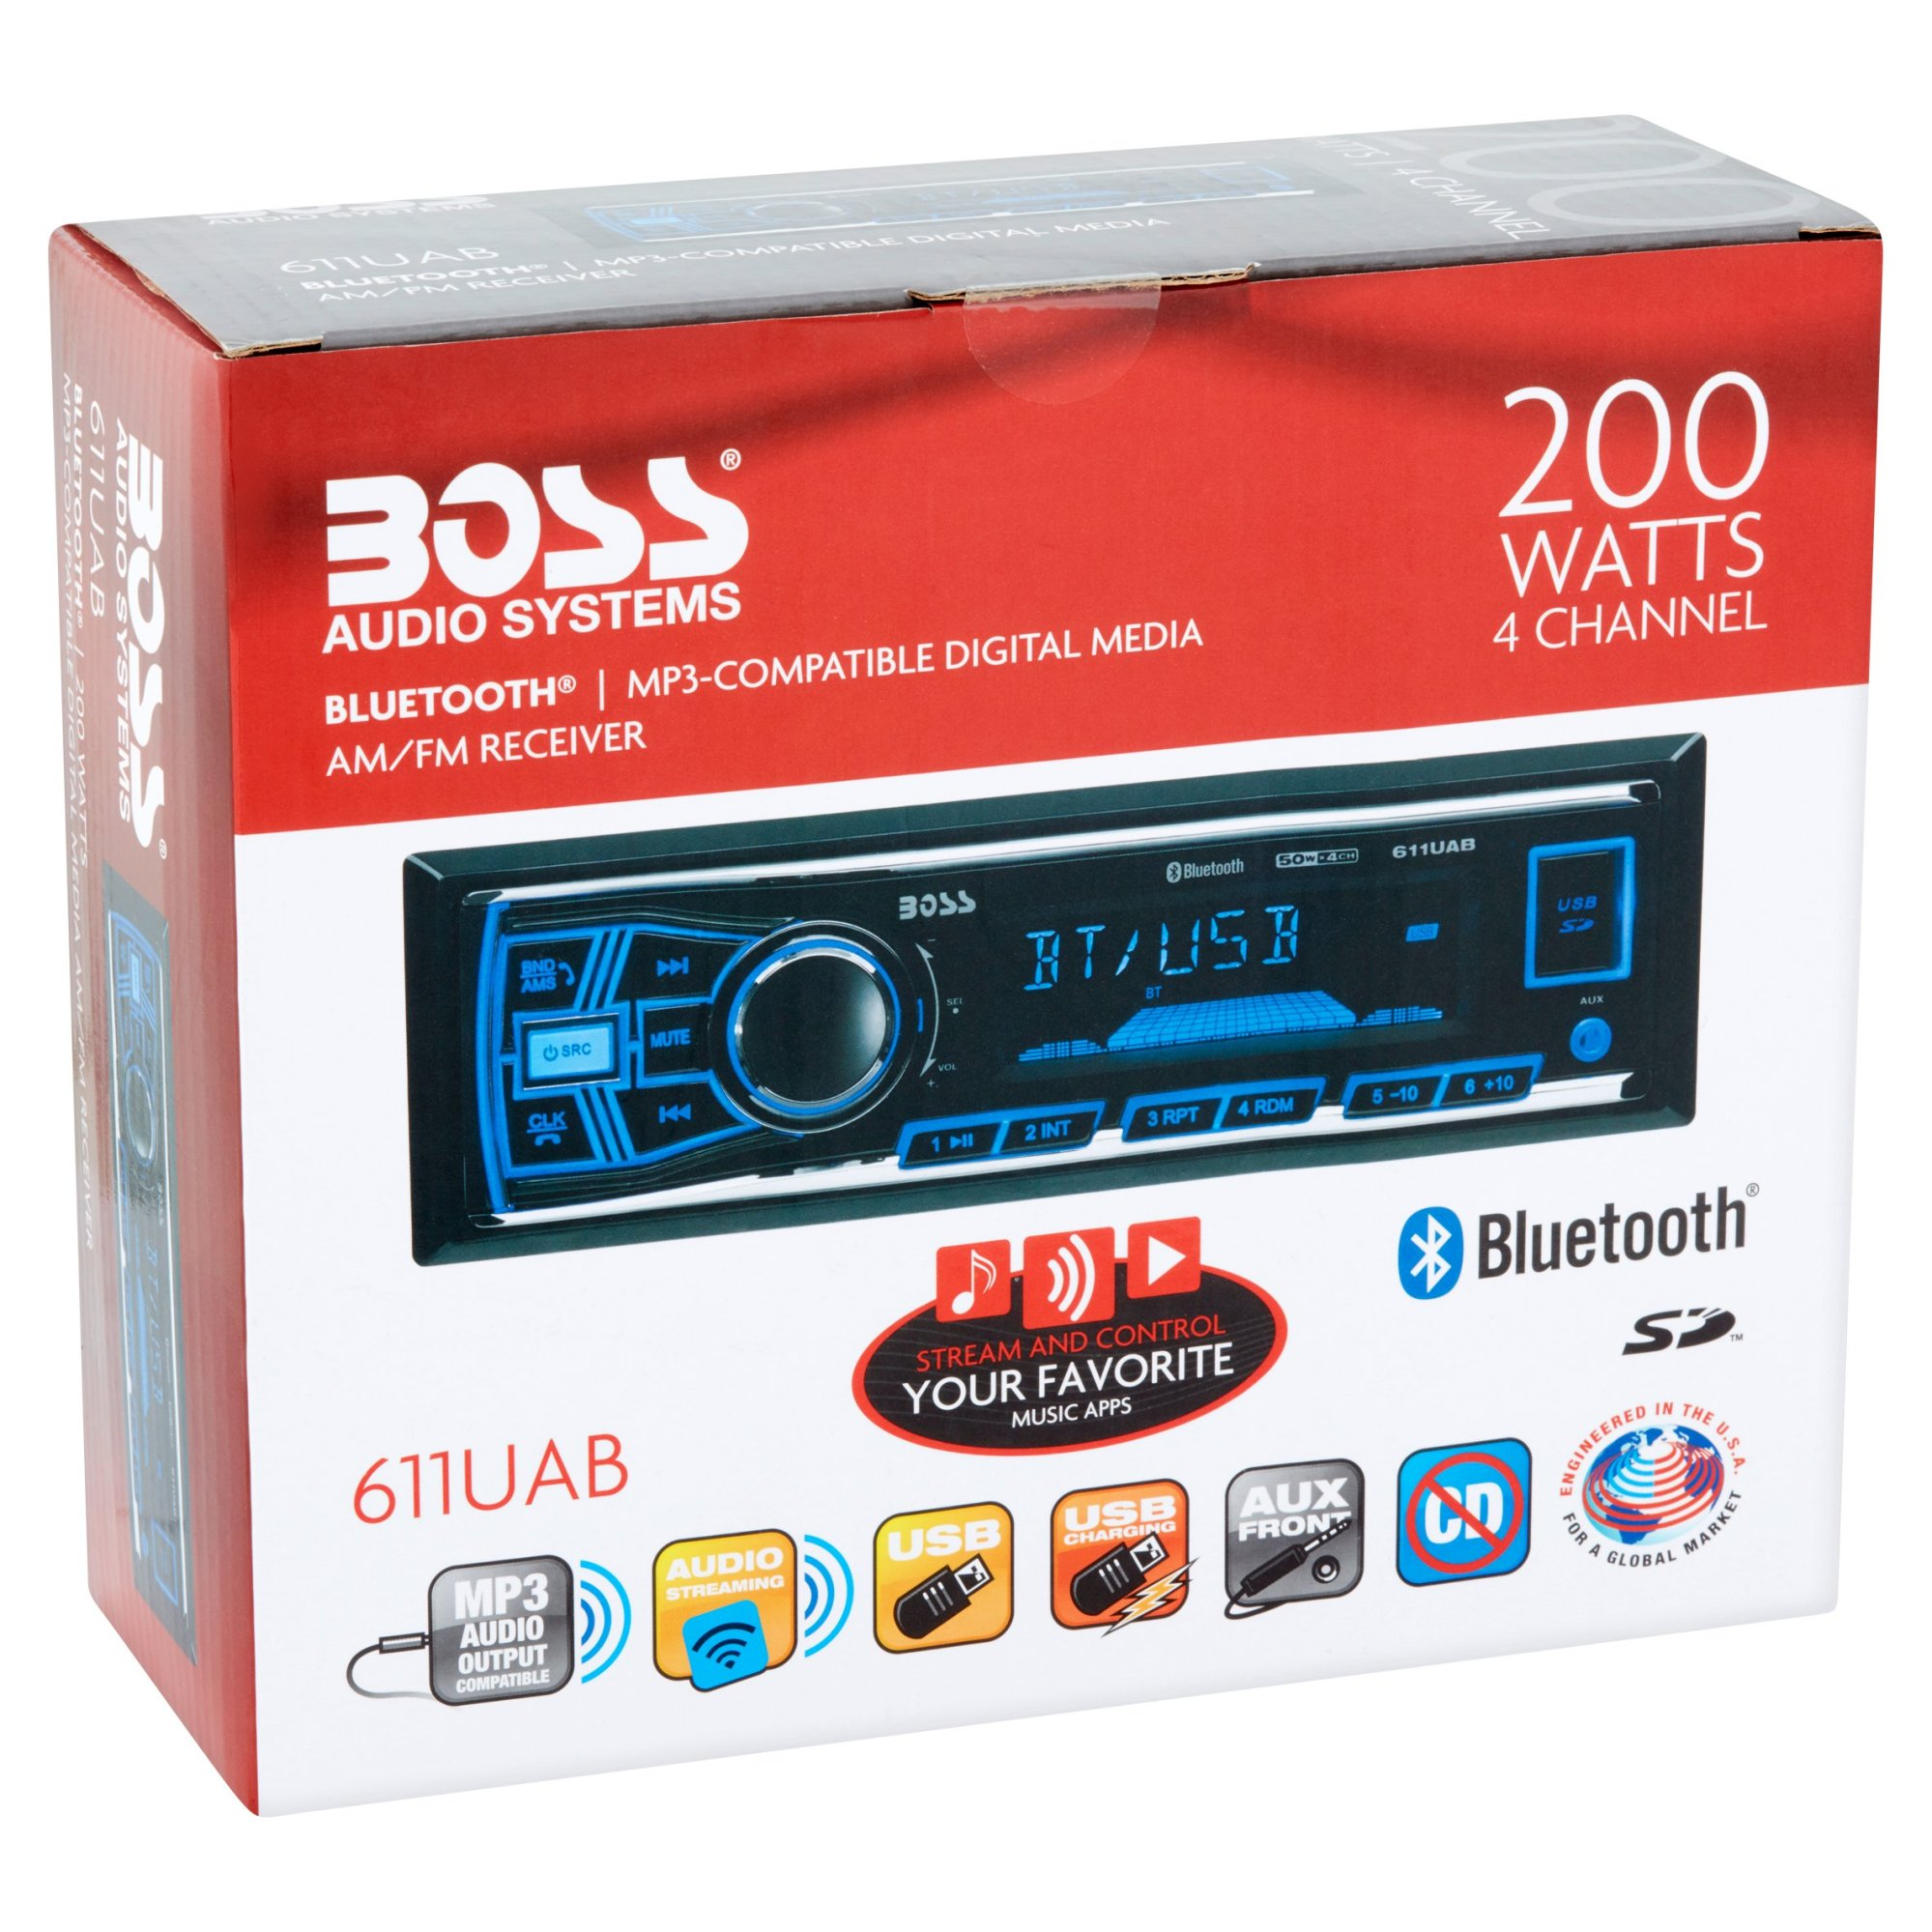 hight resolution of boss 611uab boss audio 611uab single din mech less receiver bluetooth in dash mp3 wma am fm 12 18 x am fm preset sd bluetooth usb